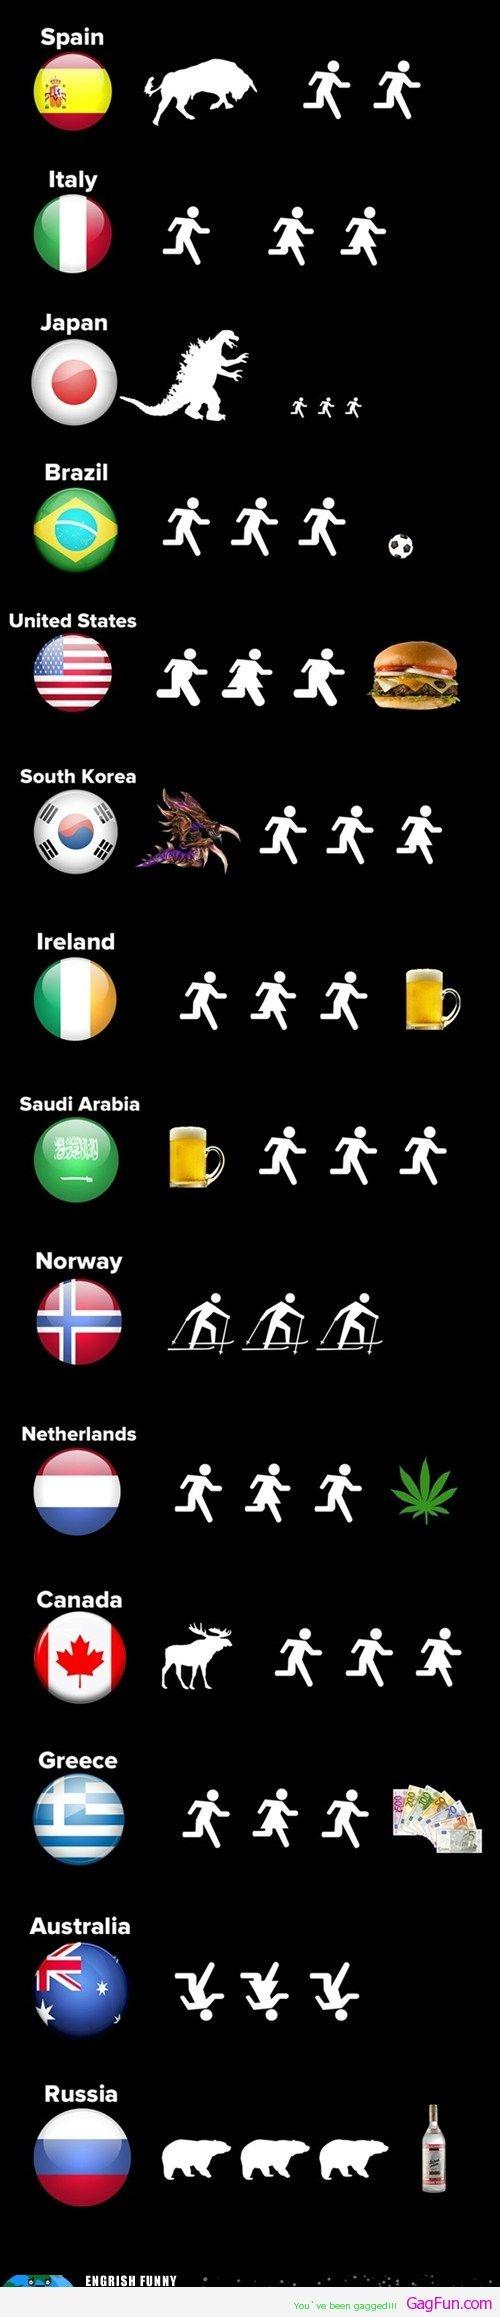 Running with countries around the world